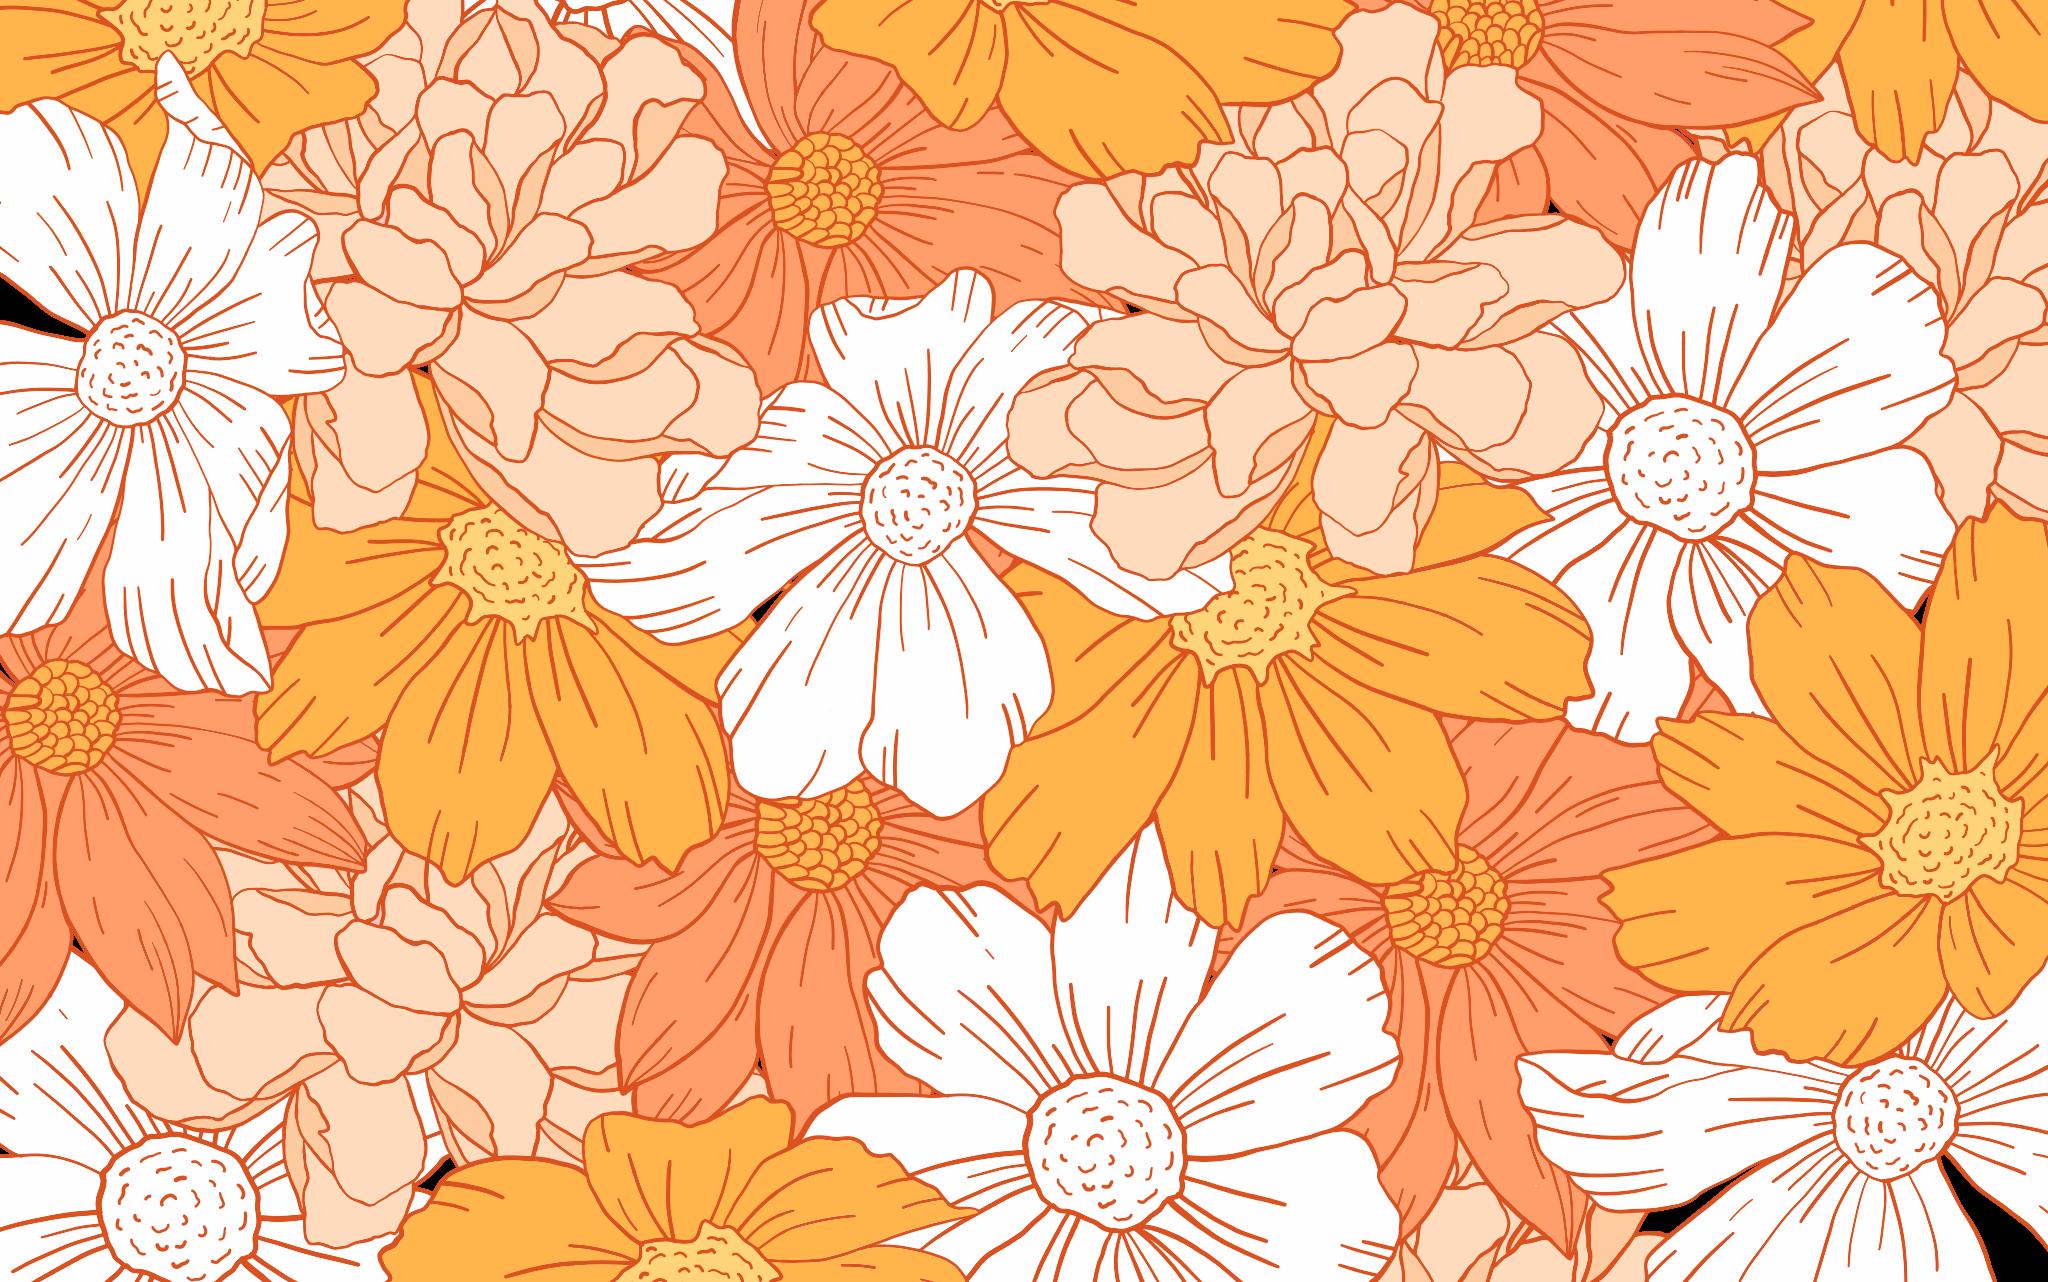 Google Image Result For Https Wallpaperaccess Com Full 1089635 Png In 2020 Desktop Wallpaper Art Cute Desktop Wallpaper Laptop Wallpaper Desktop Wallpapers